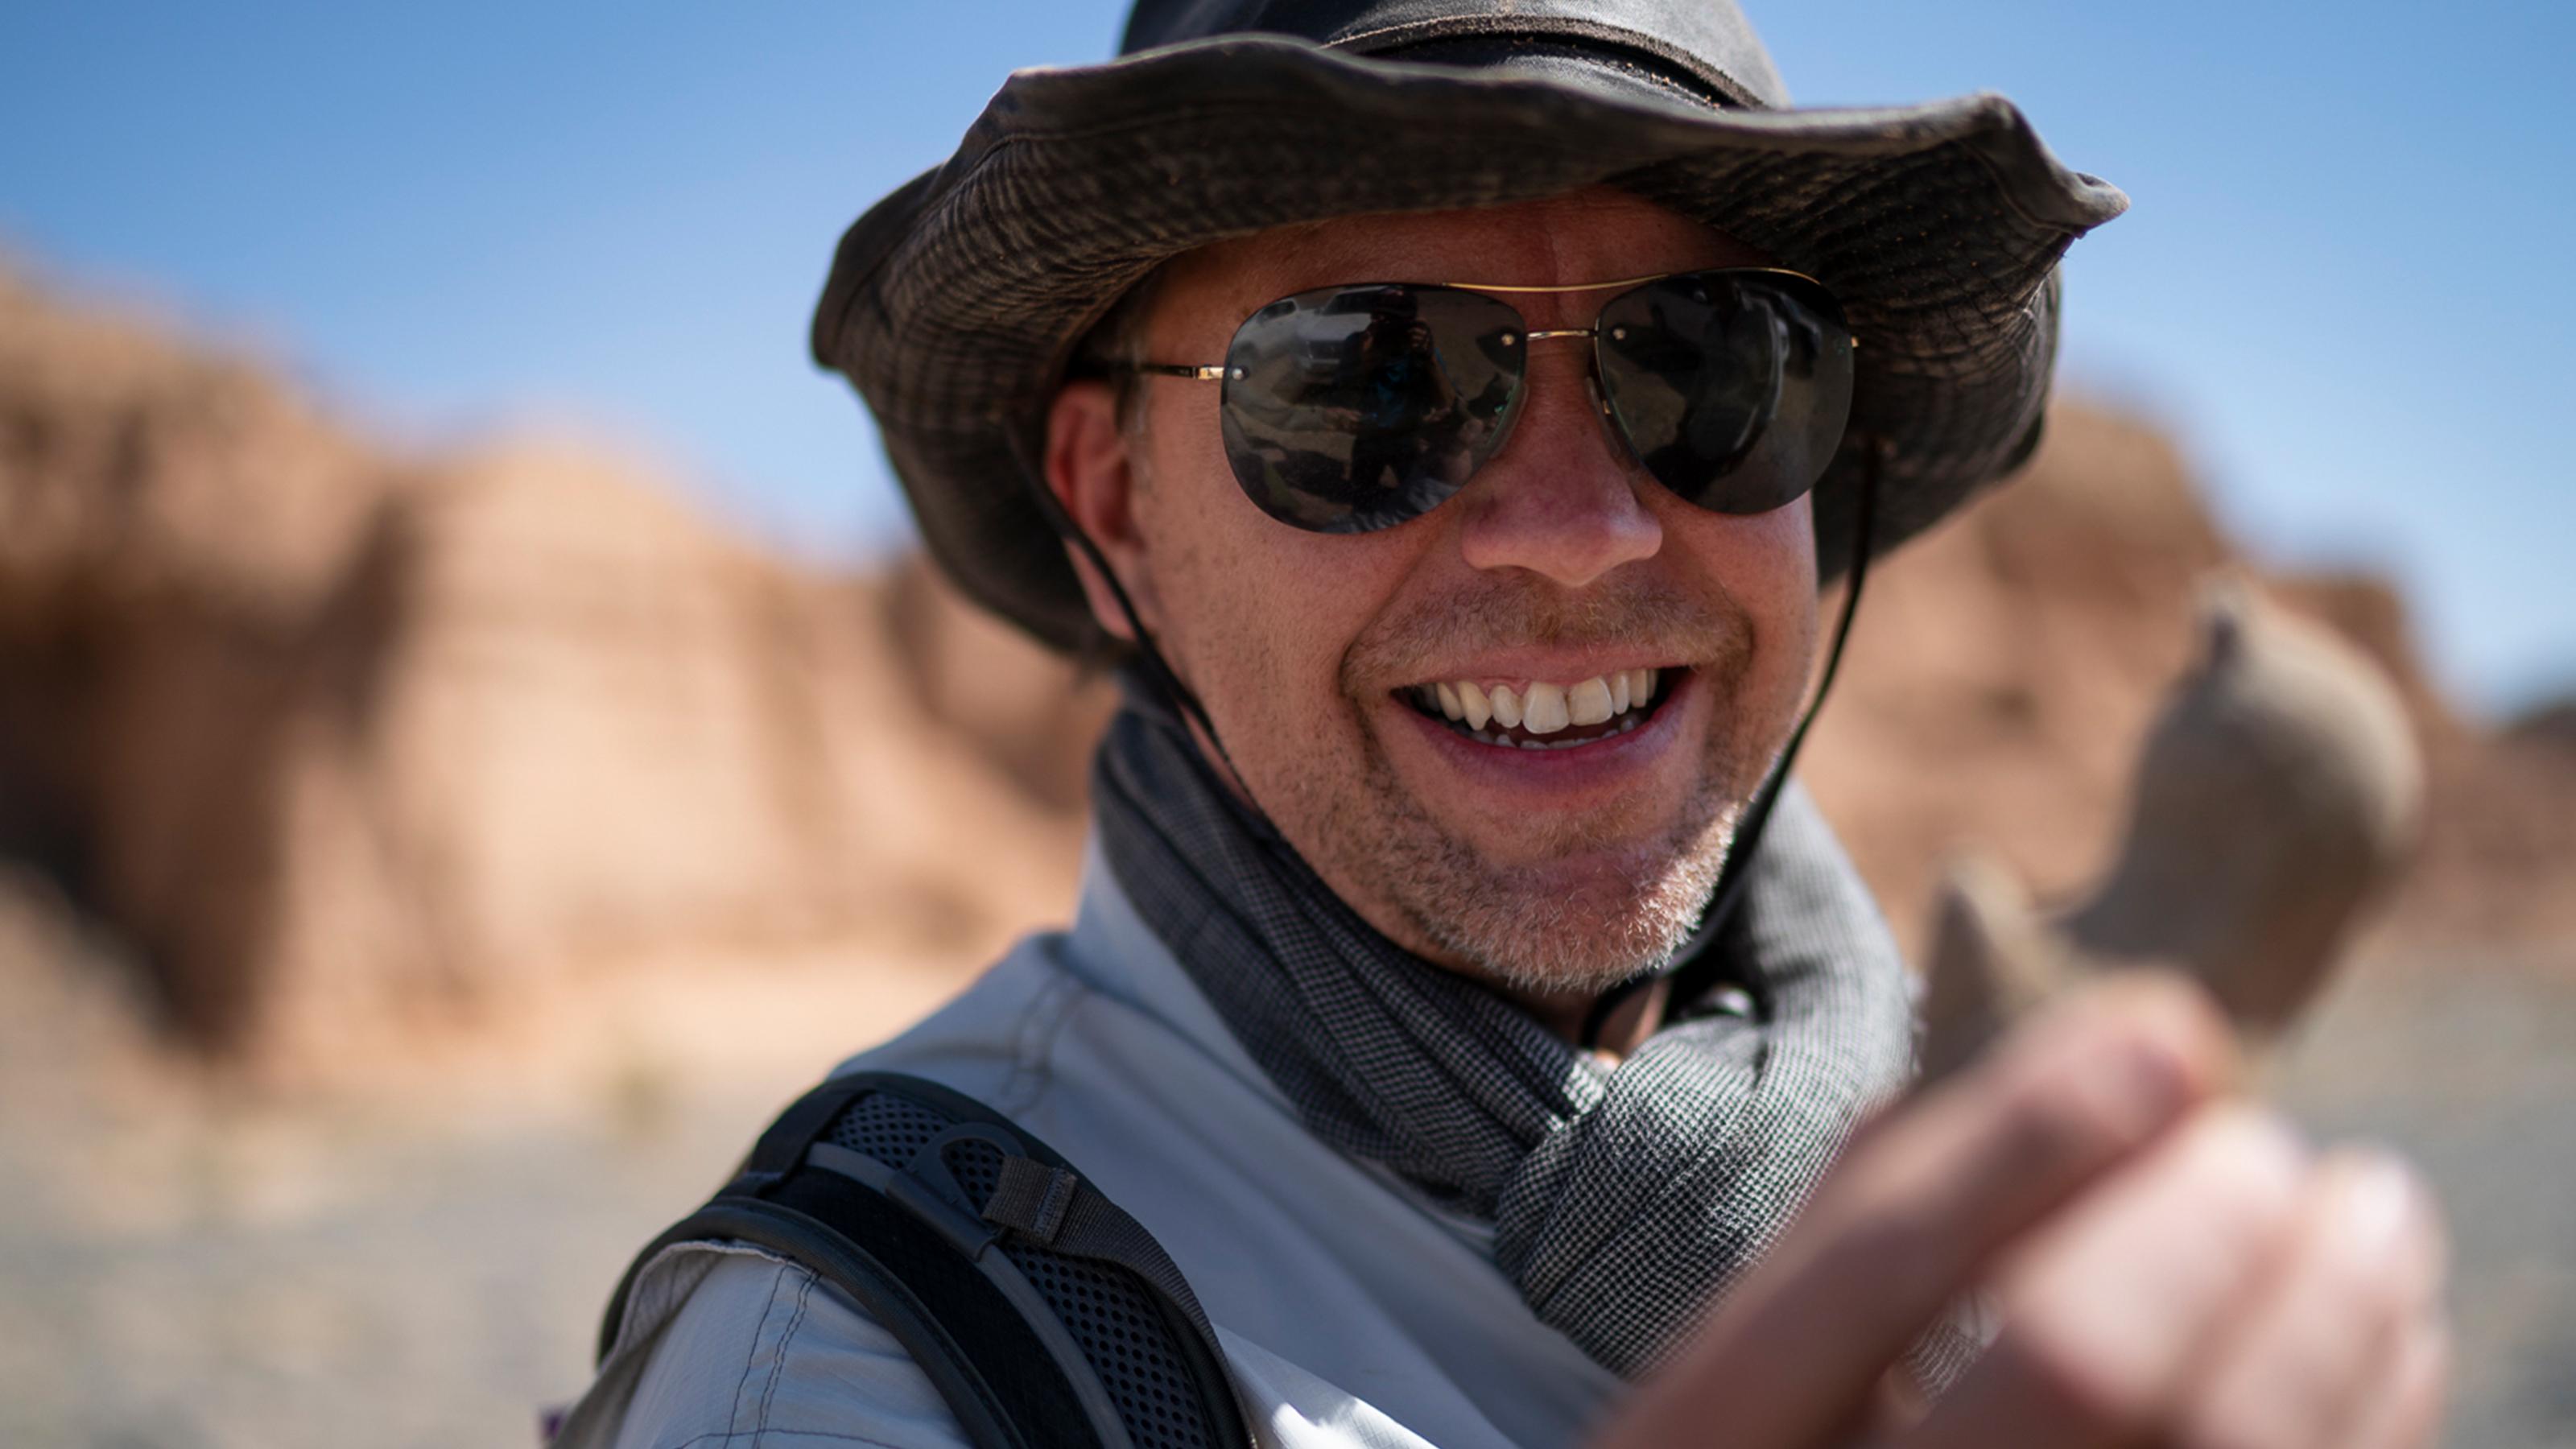 INFINITI QX Series unveil new dinosaur fossils in Gobi Desert